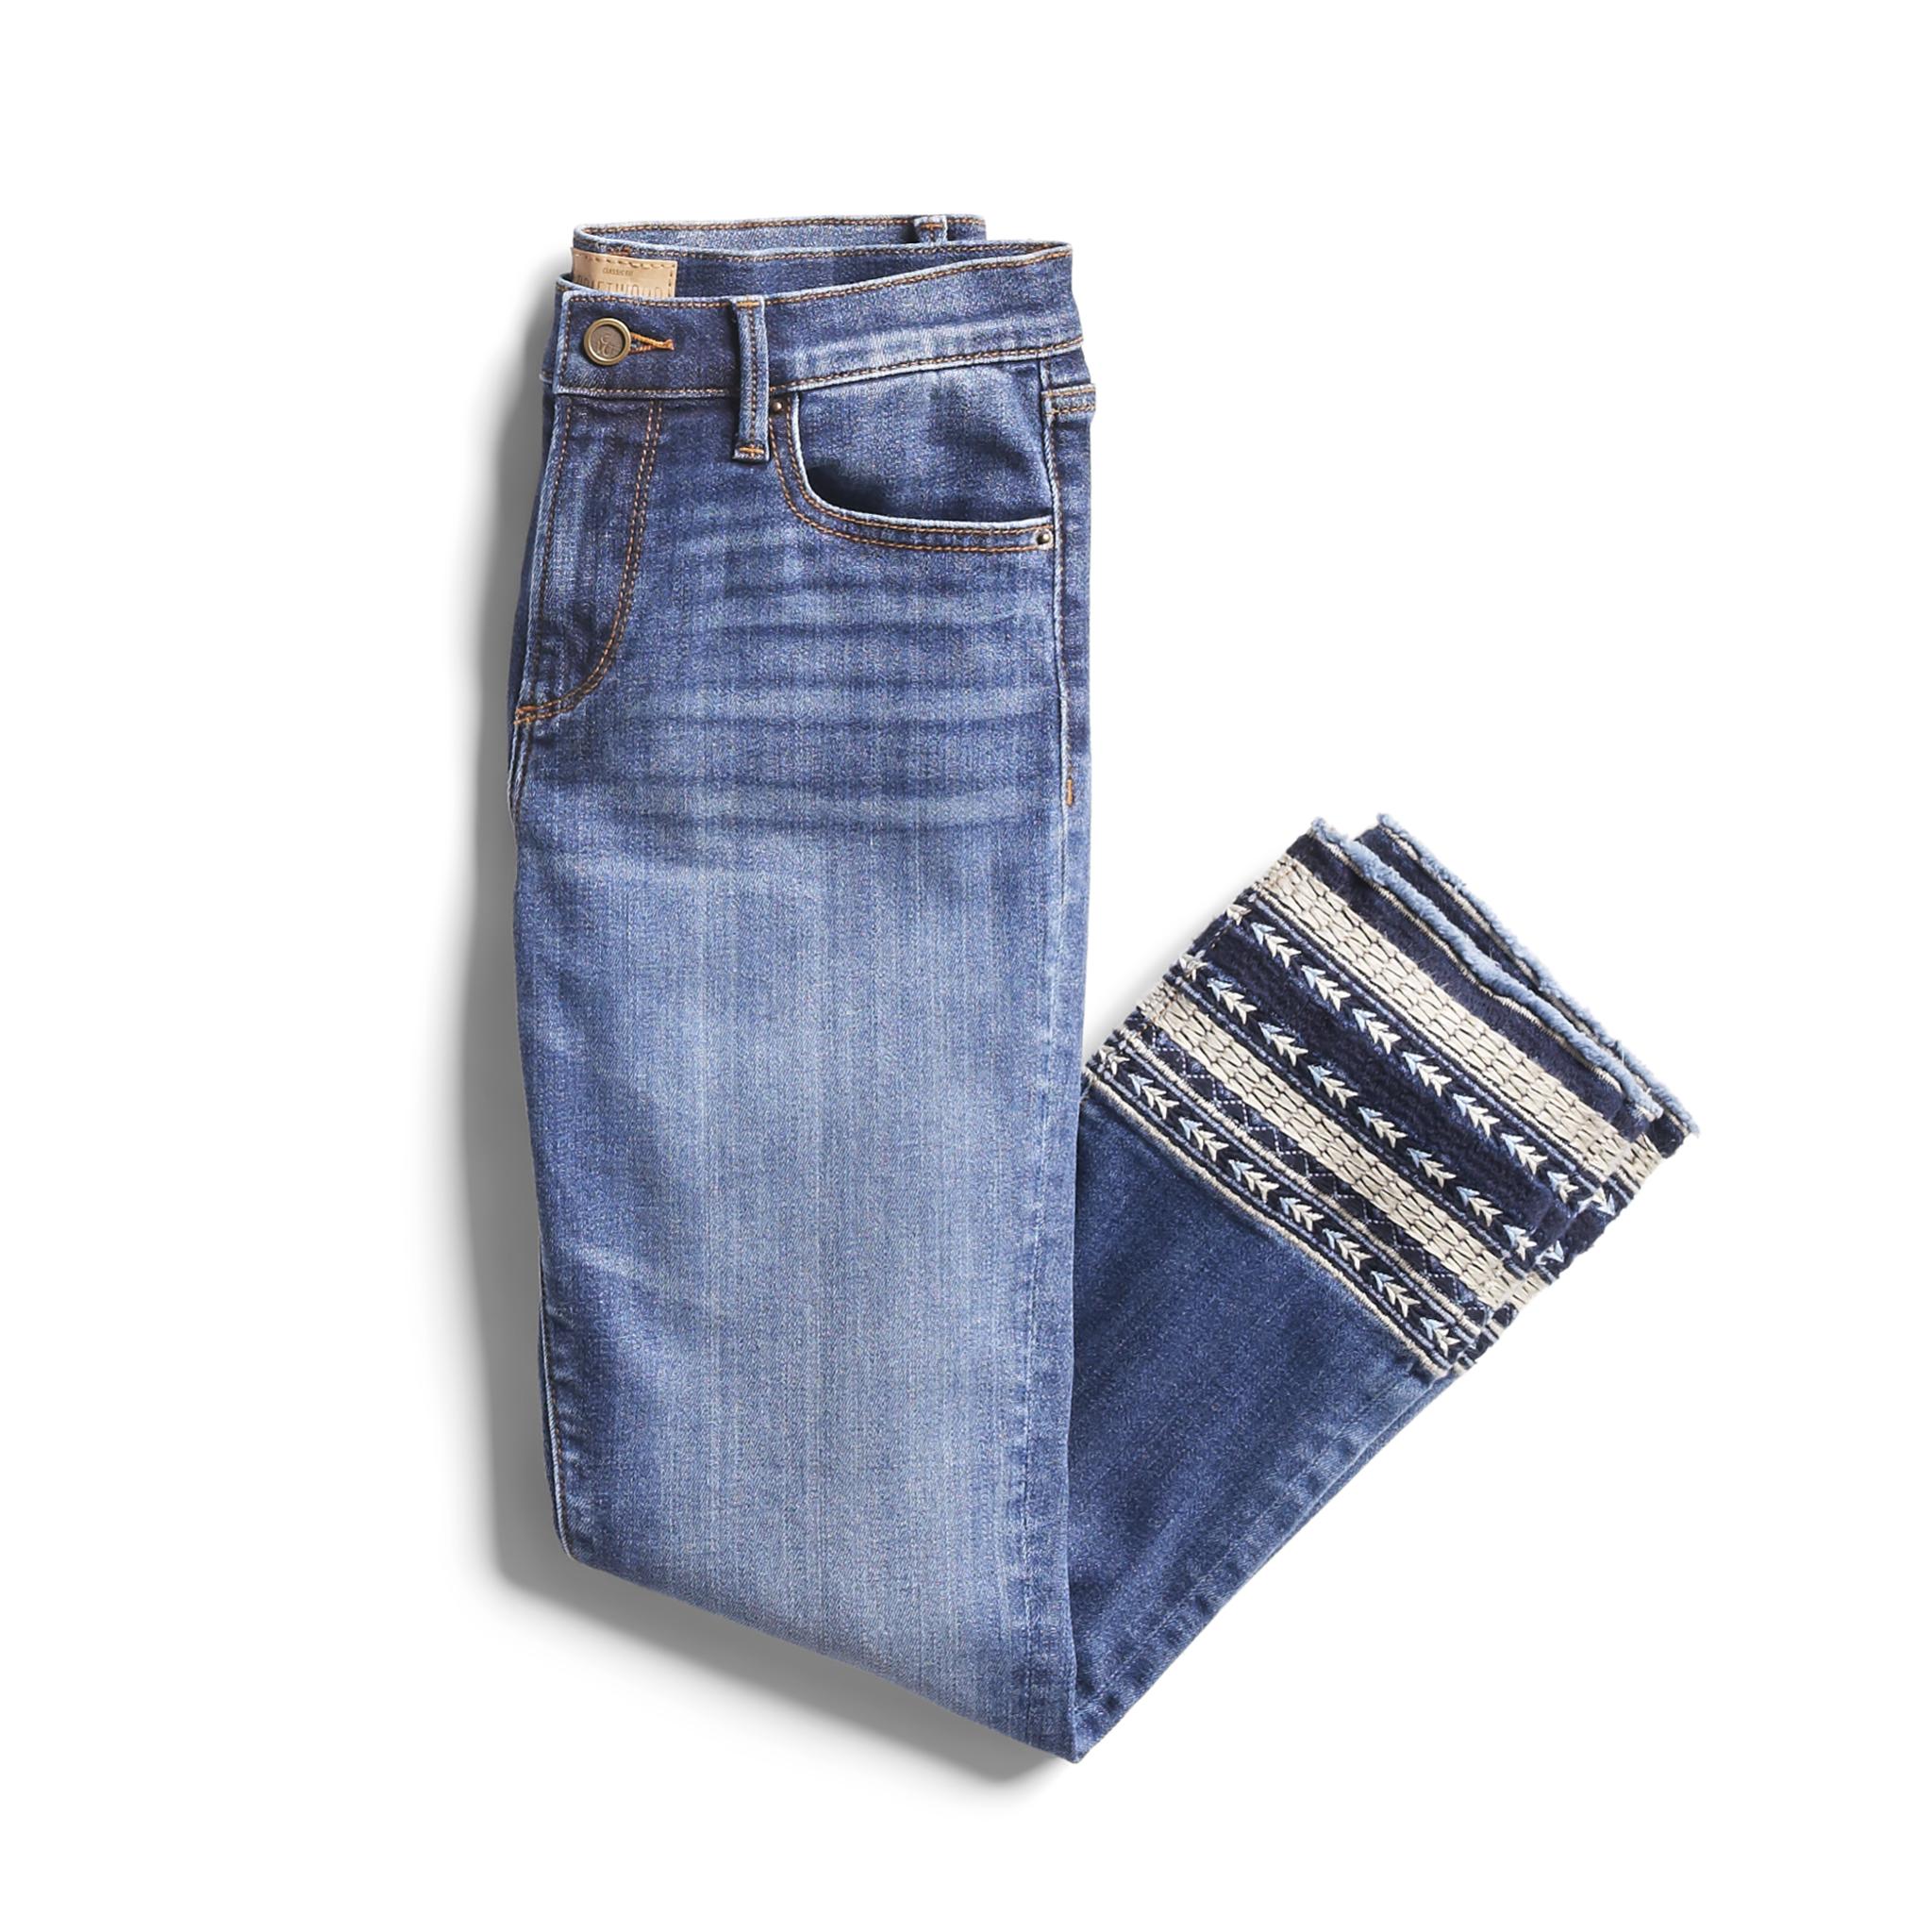 How To Hem Pants With A Cuff Spring Stylist Picks Embroidered Cuff Denim Stitch Fit Stitch Fix Outfits Stitch Fix Stylist